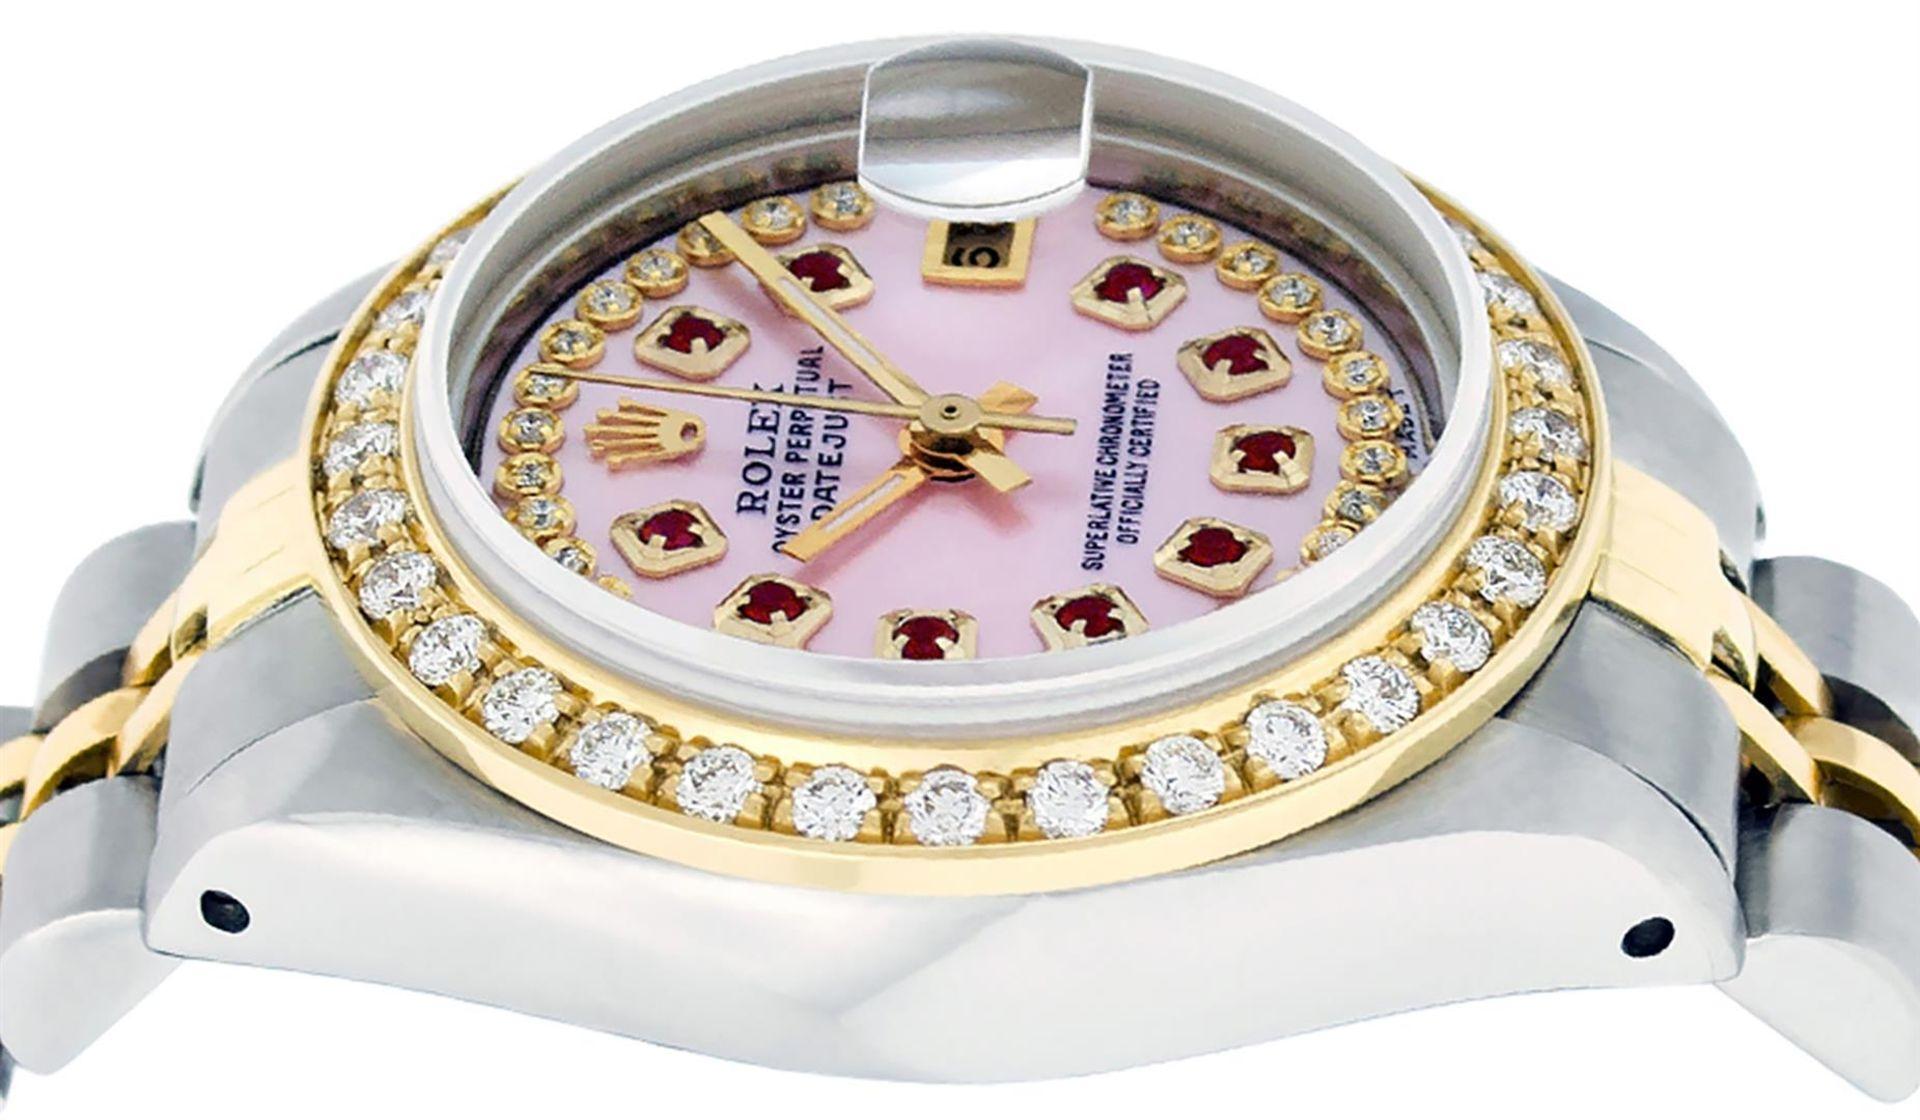 Rolex Ladies 2 Tone Pink MOP Ruby String Diamond Datejust Wristwatch - Image 4 of 9